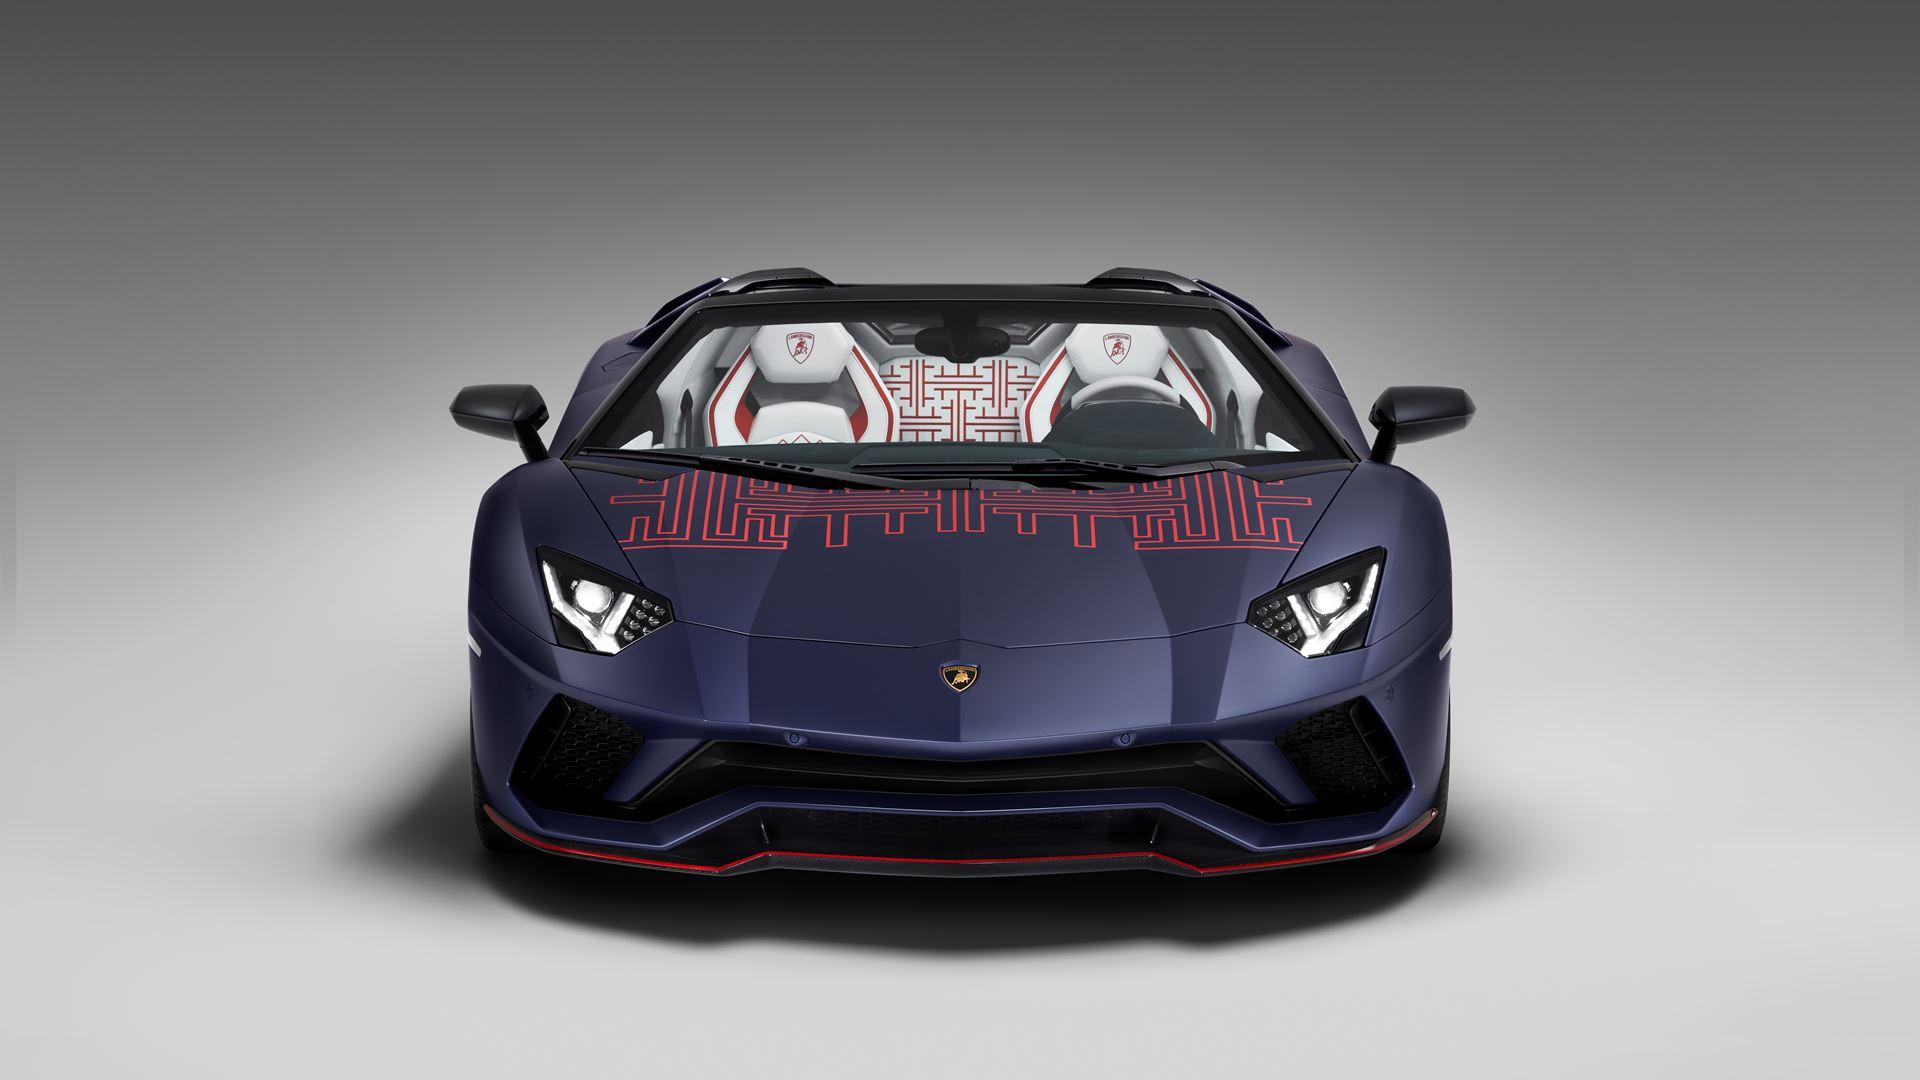 Lamborghini Seoul Unveils the Aventador S Roadster Korean Special Series - Image 4